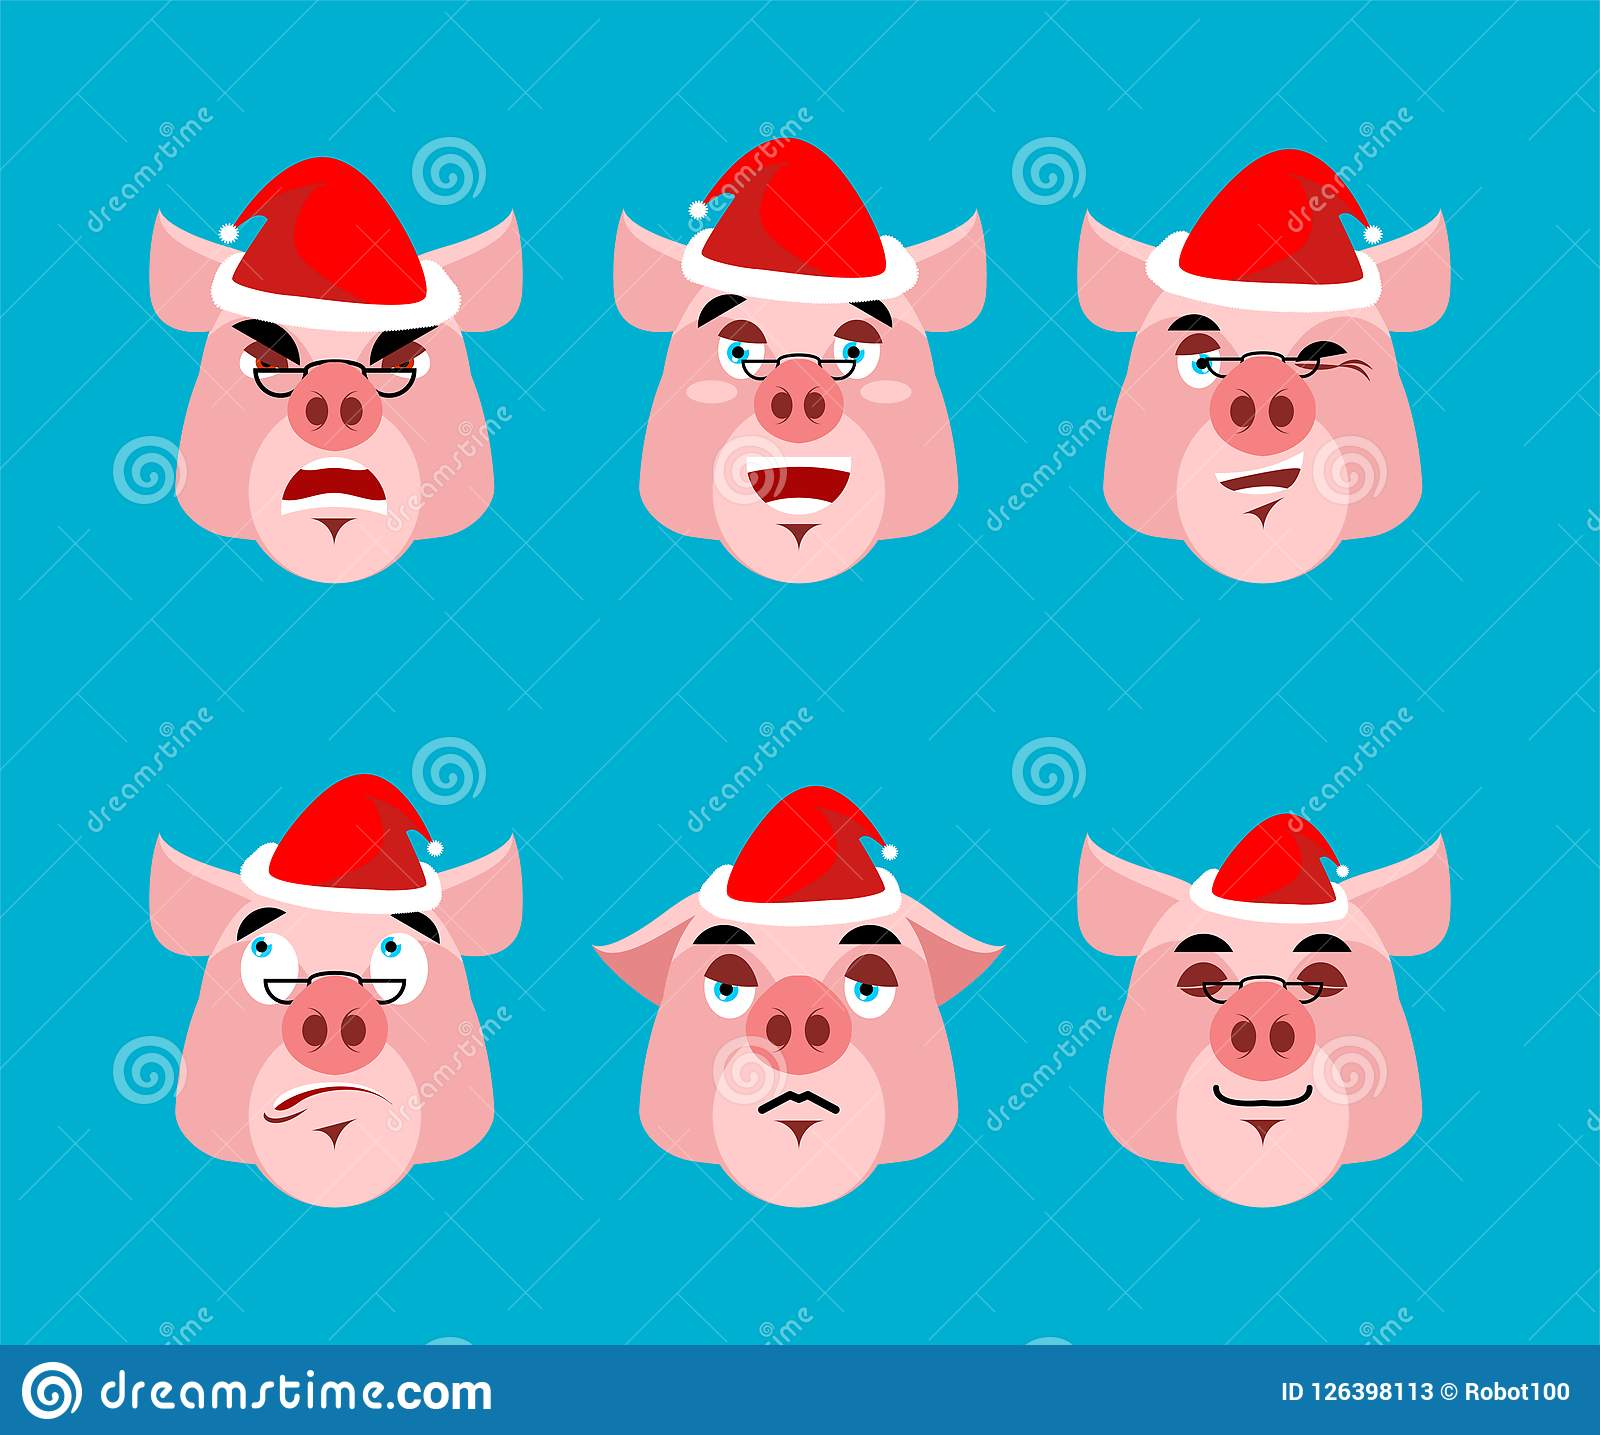 Santa Pig Emoji Set  Face Collection  Good And Evil  Cheerful An